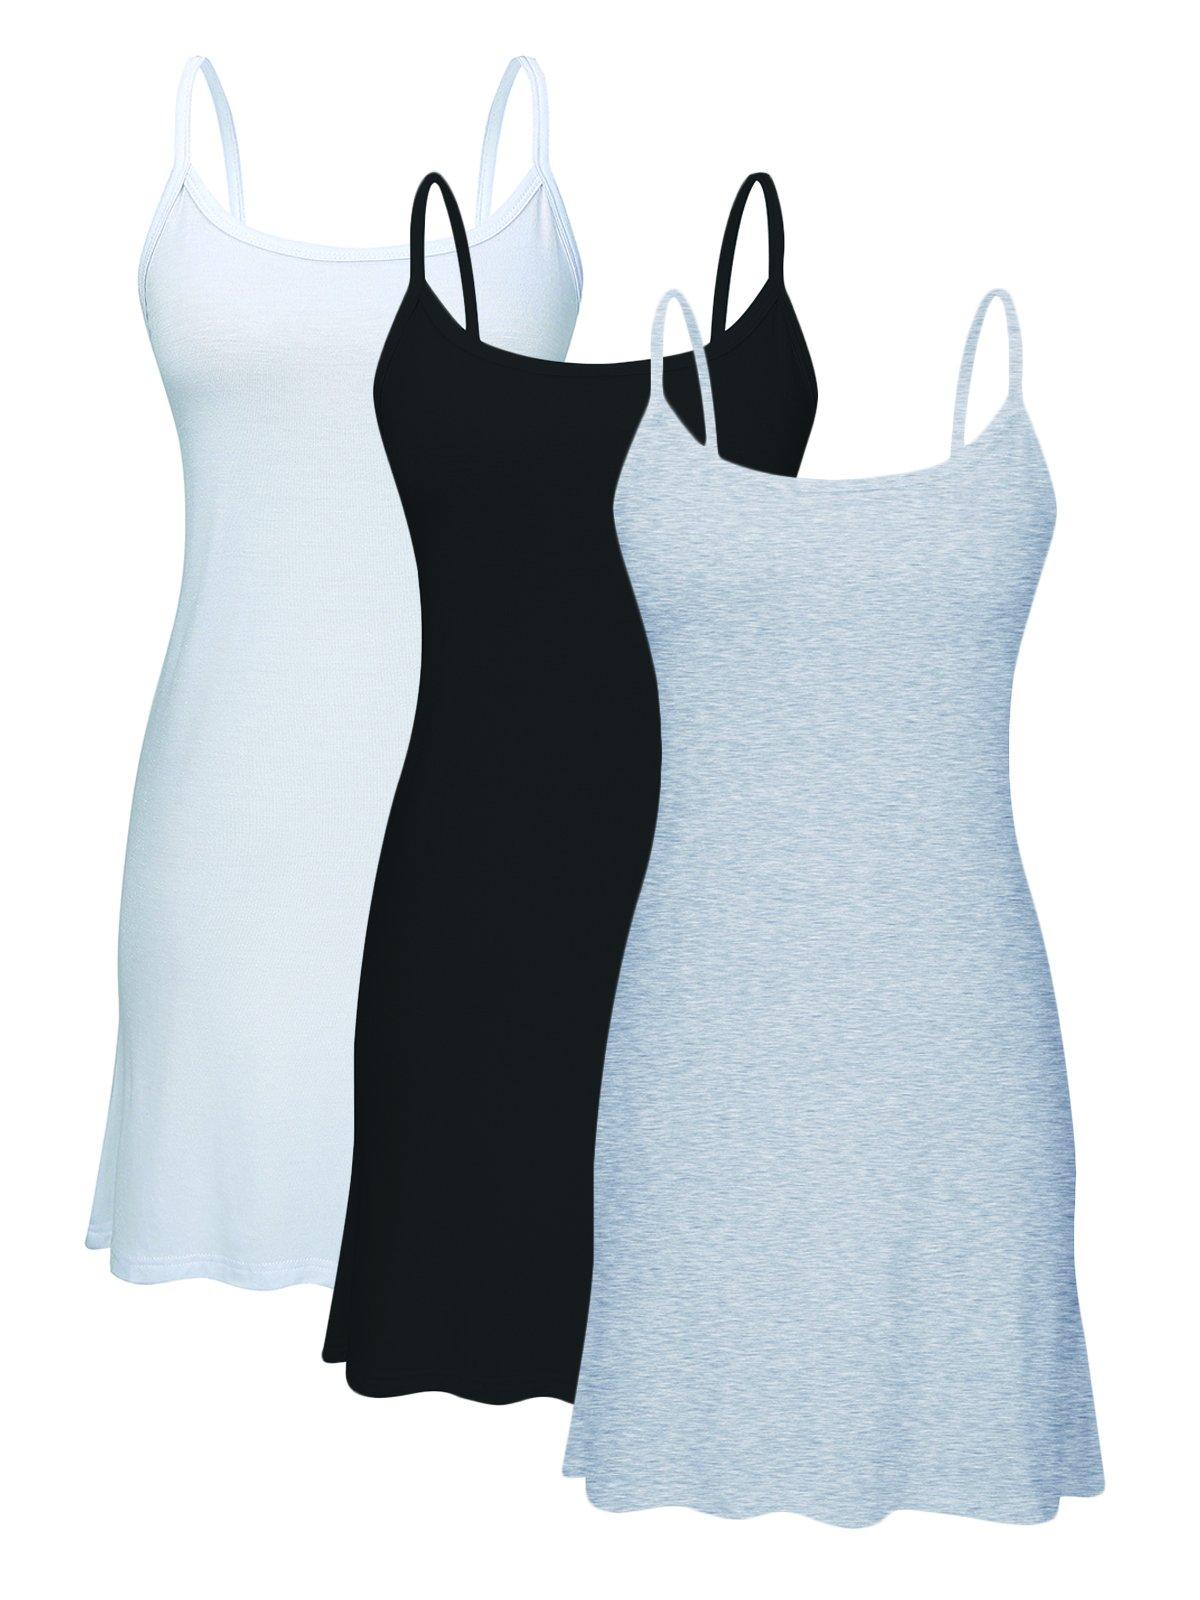 Century Star Women's Stretch Cotton Cami Basic Solid Long Length Adjustable Spaghetti Strap Tank Top 3 Pack - Black/White/Grey 6XL/US 18W-22W